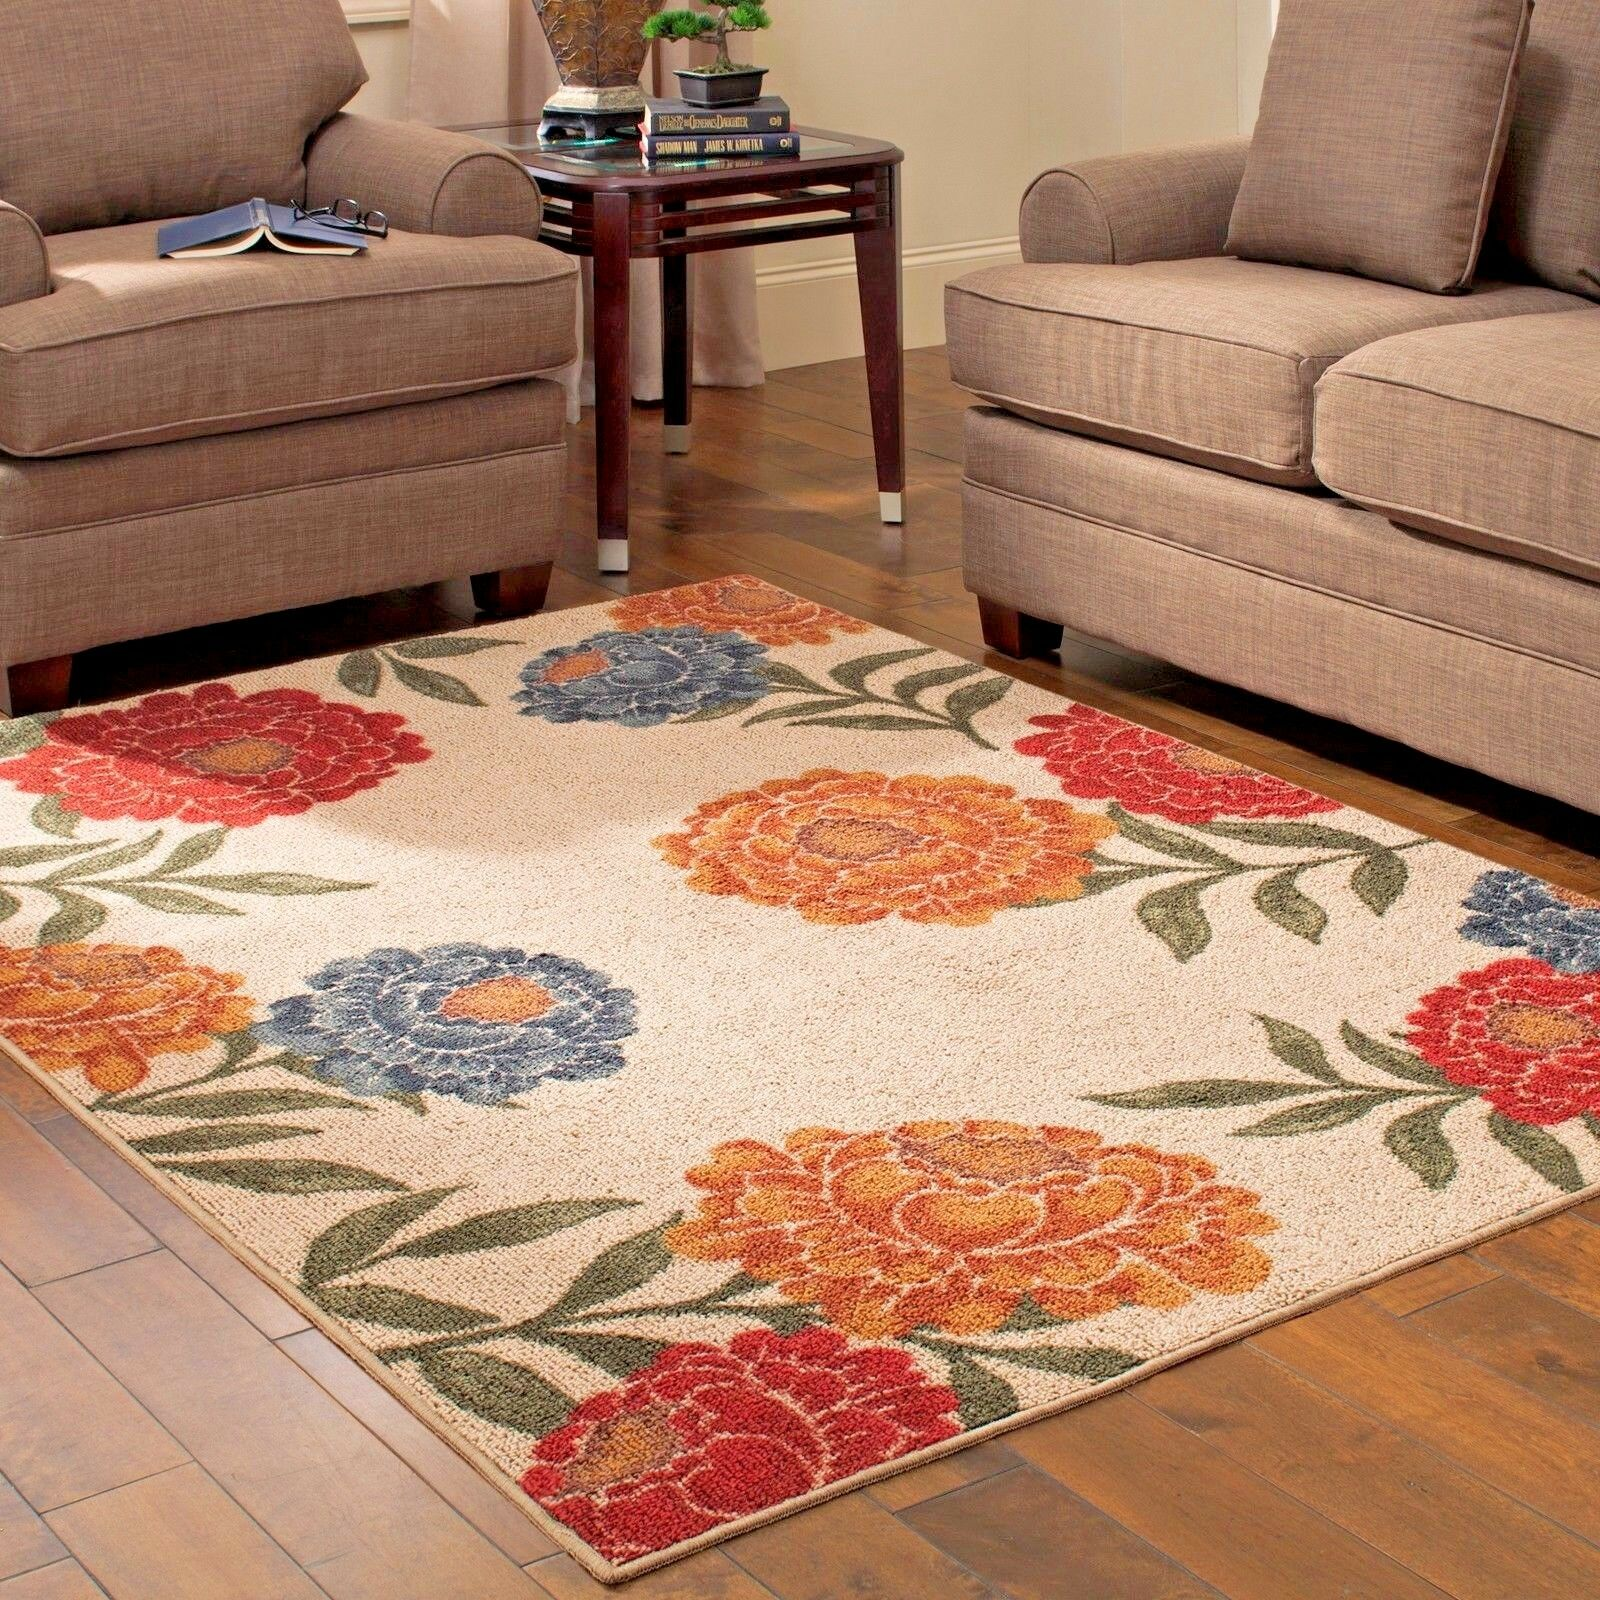 Rugs Area Rugs 8x10 Area Rug Carpets Floor Modern Large Floral